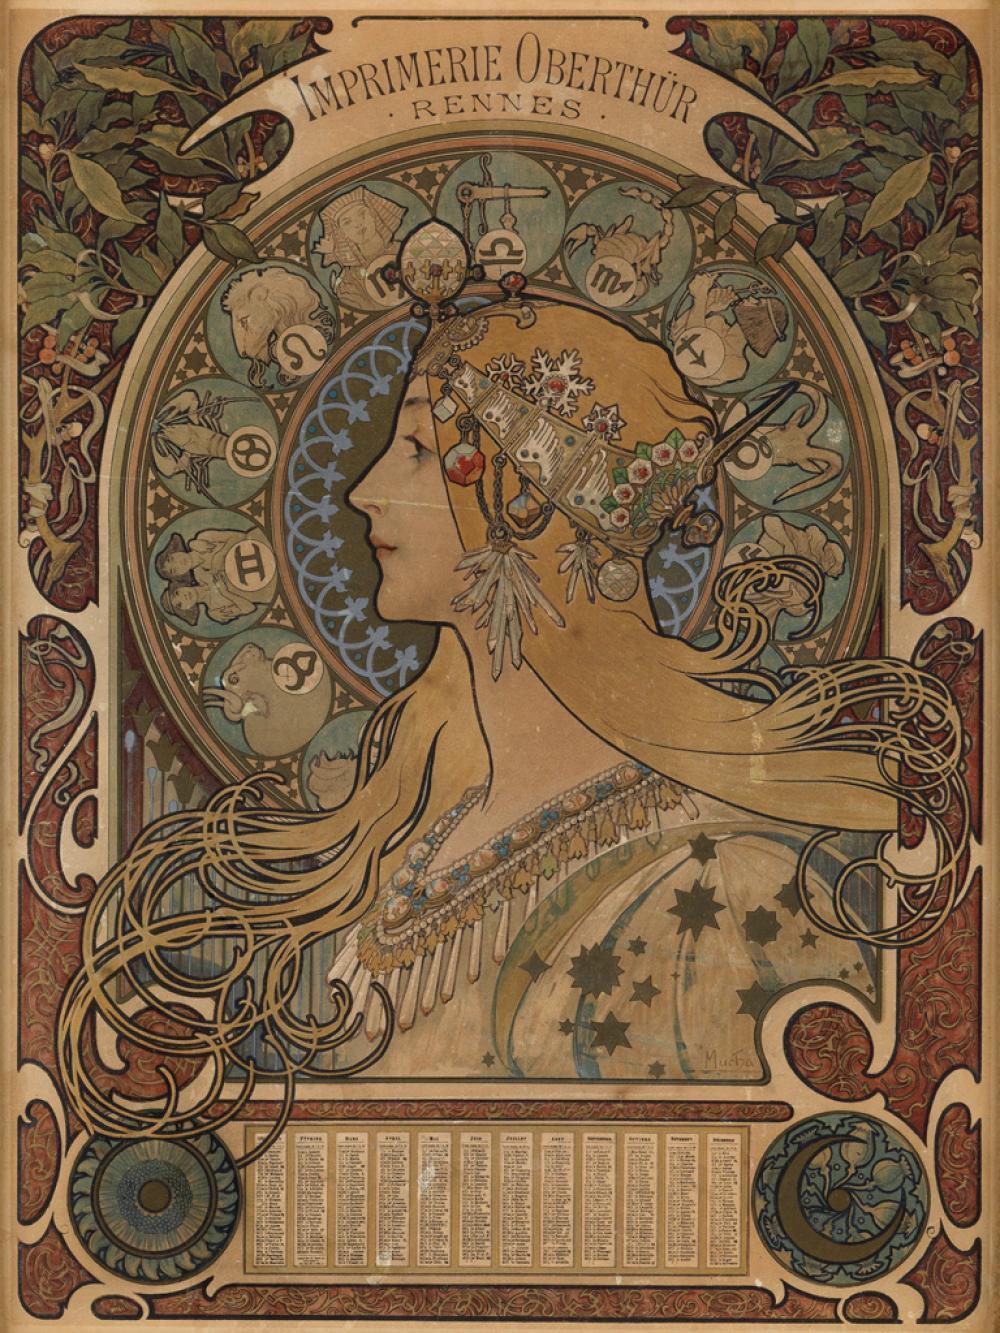 ALPHONSE MUCHA (1860-1939). [ZODIAC] / IMPRIMERIE OBERTHÜR. 1898. 17x13 inches, 43x33 cm. [F. Champenois, Paris.]